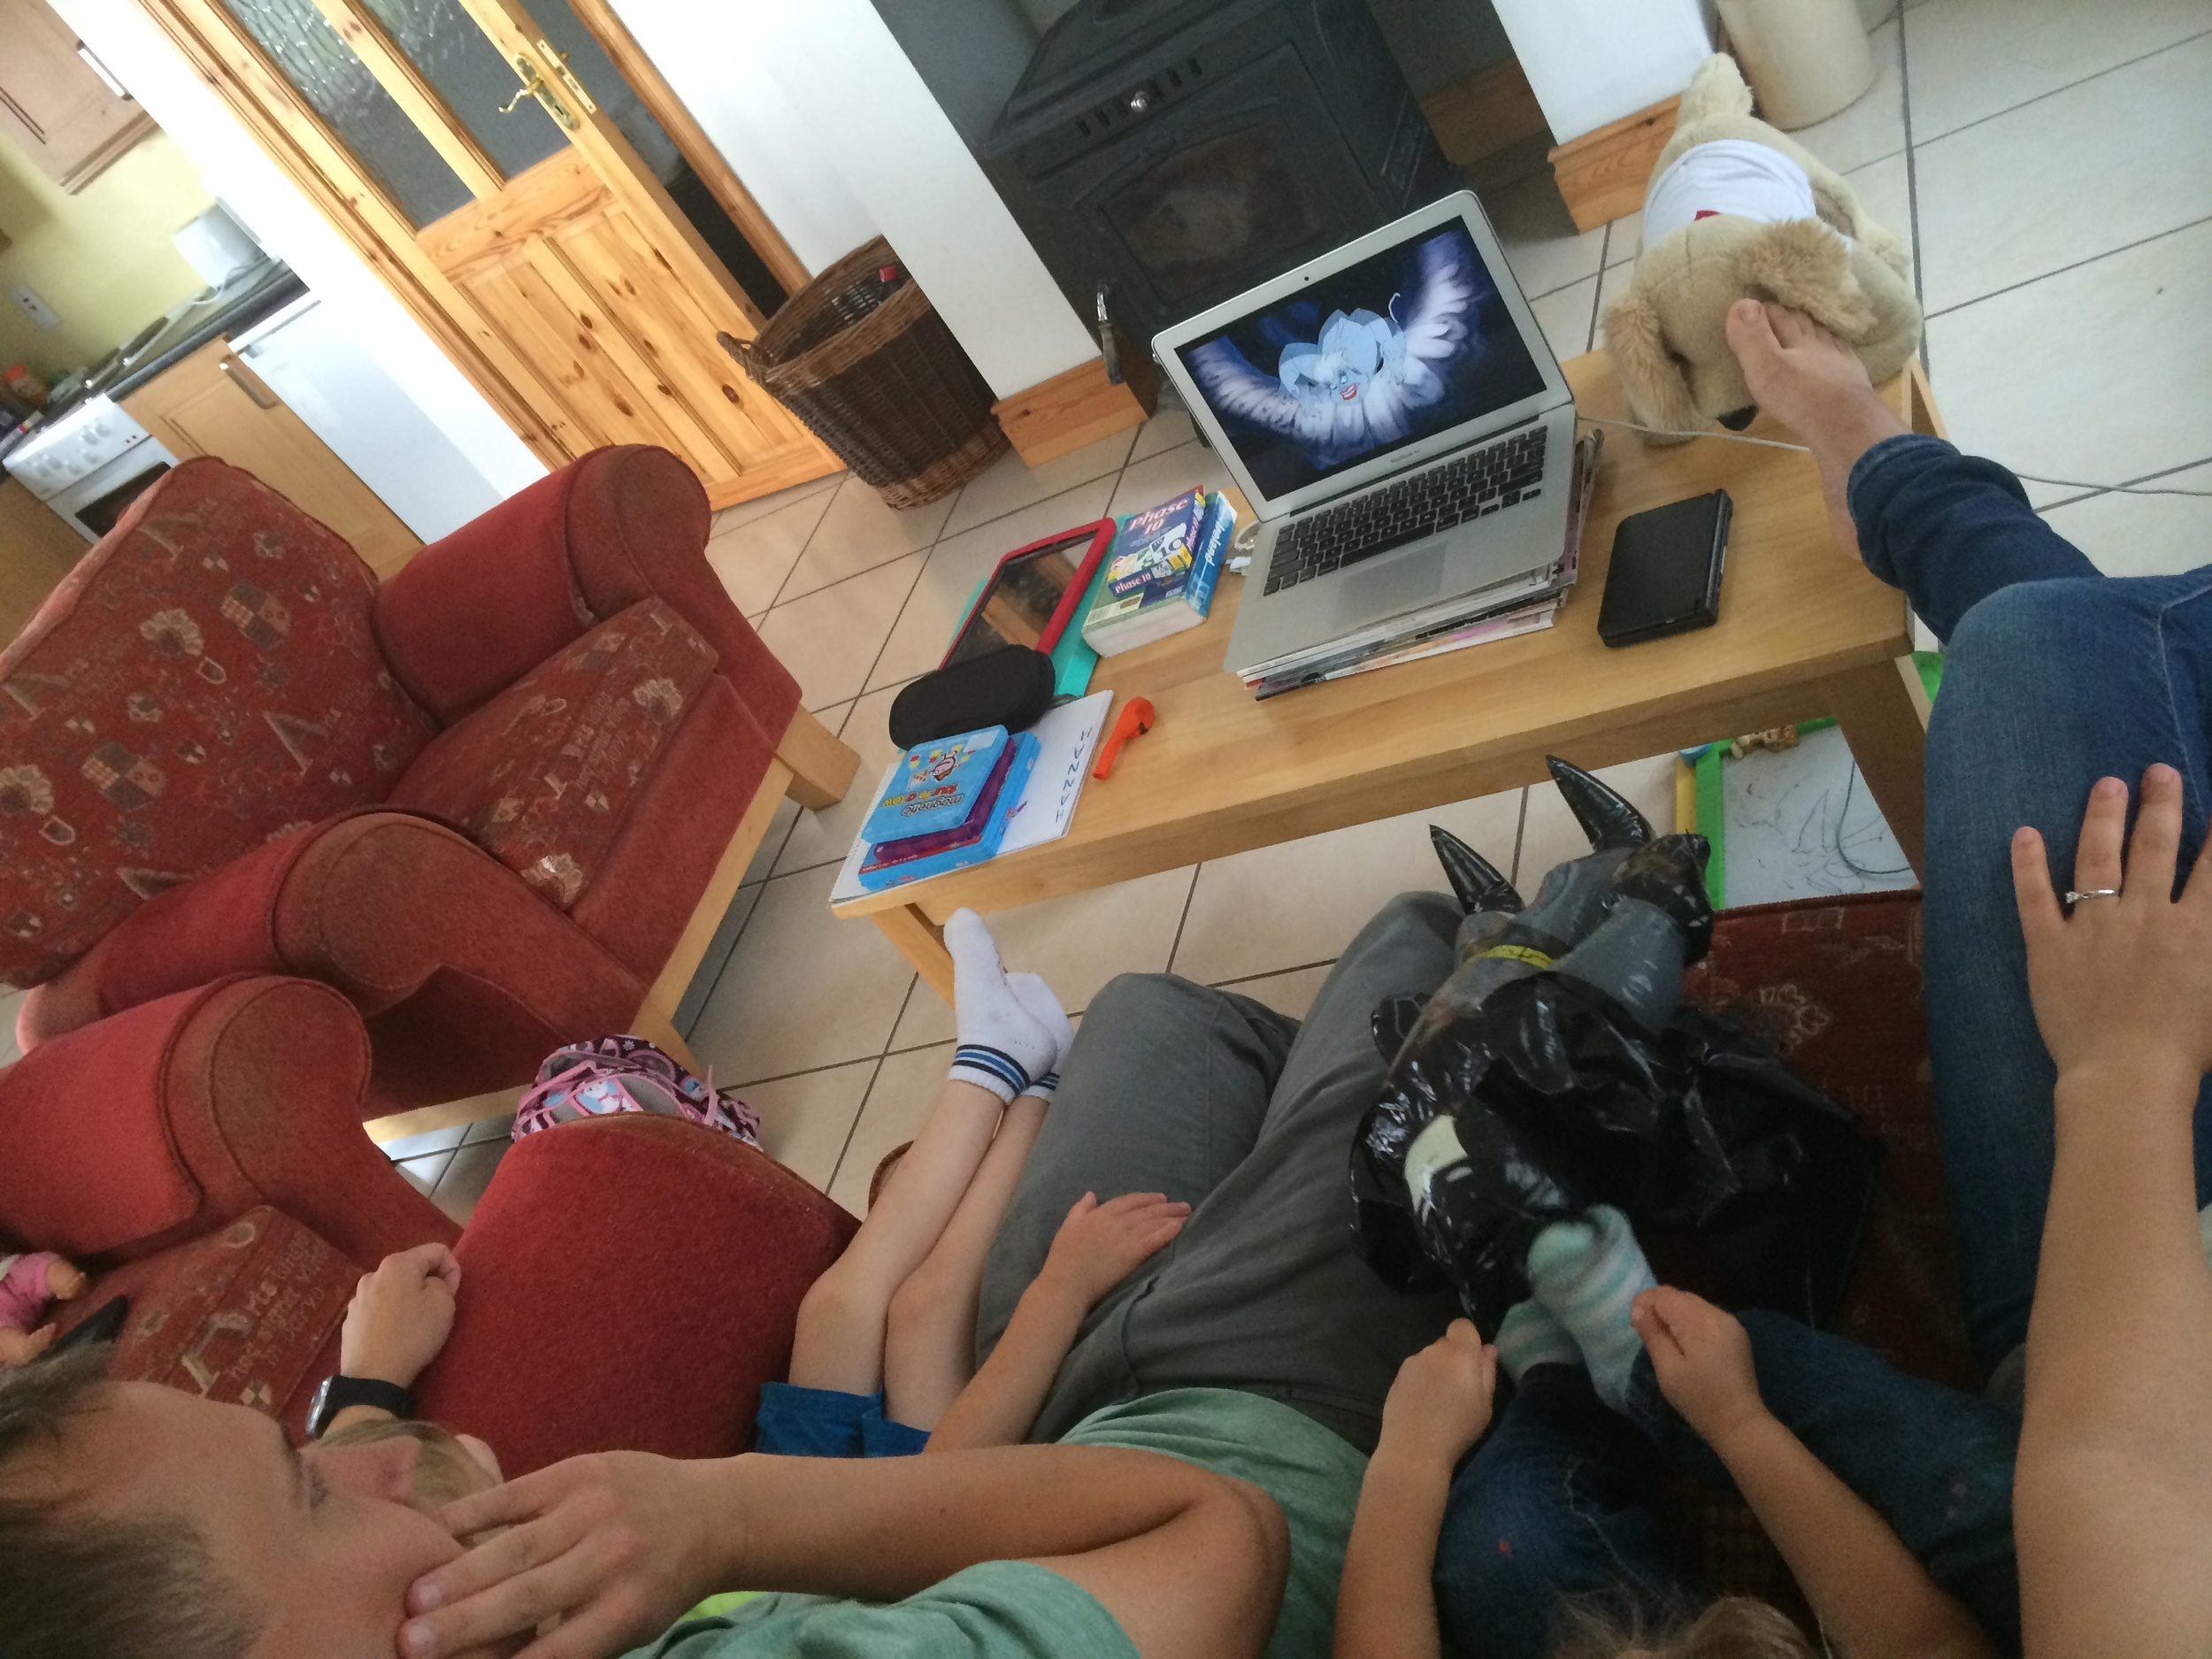 Family Movie Night - The Little Mermaid